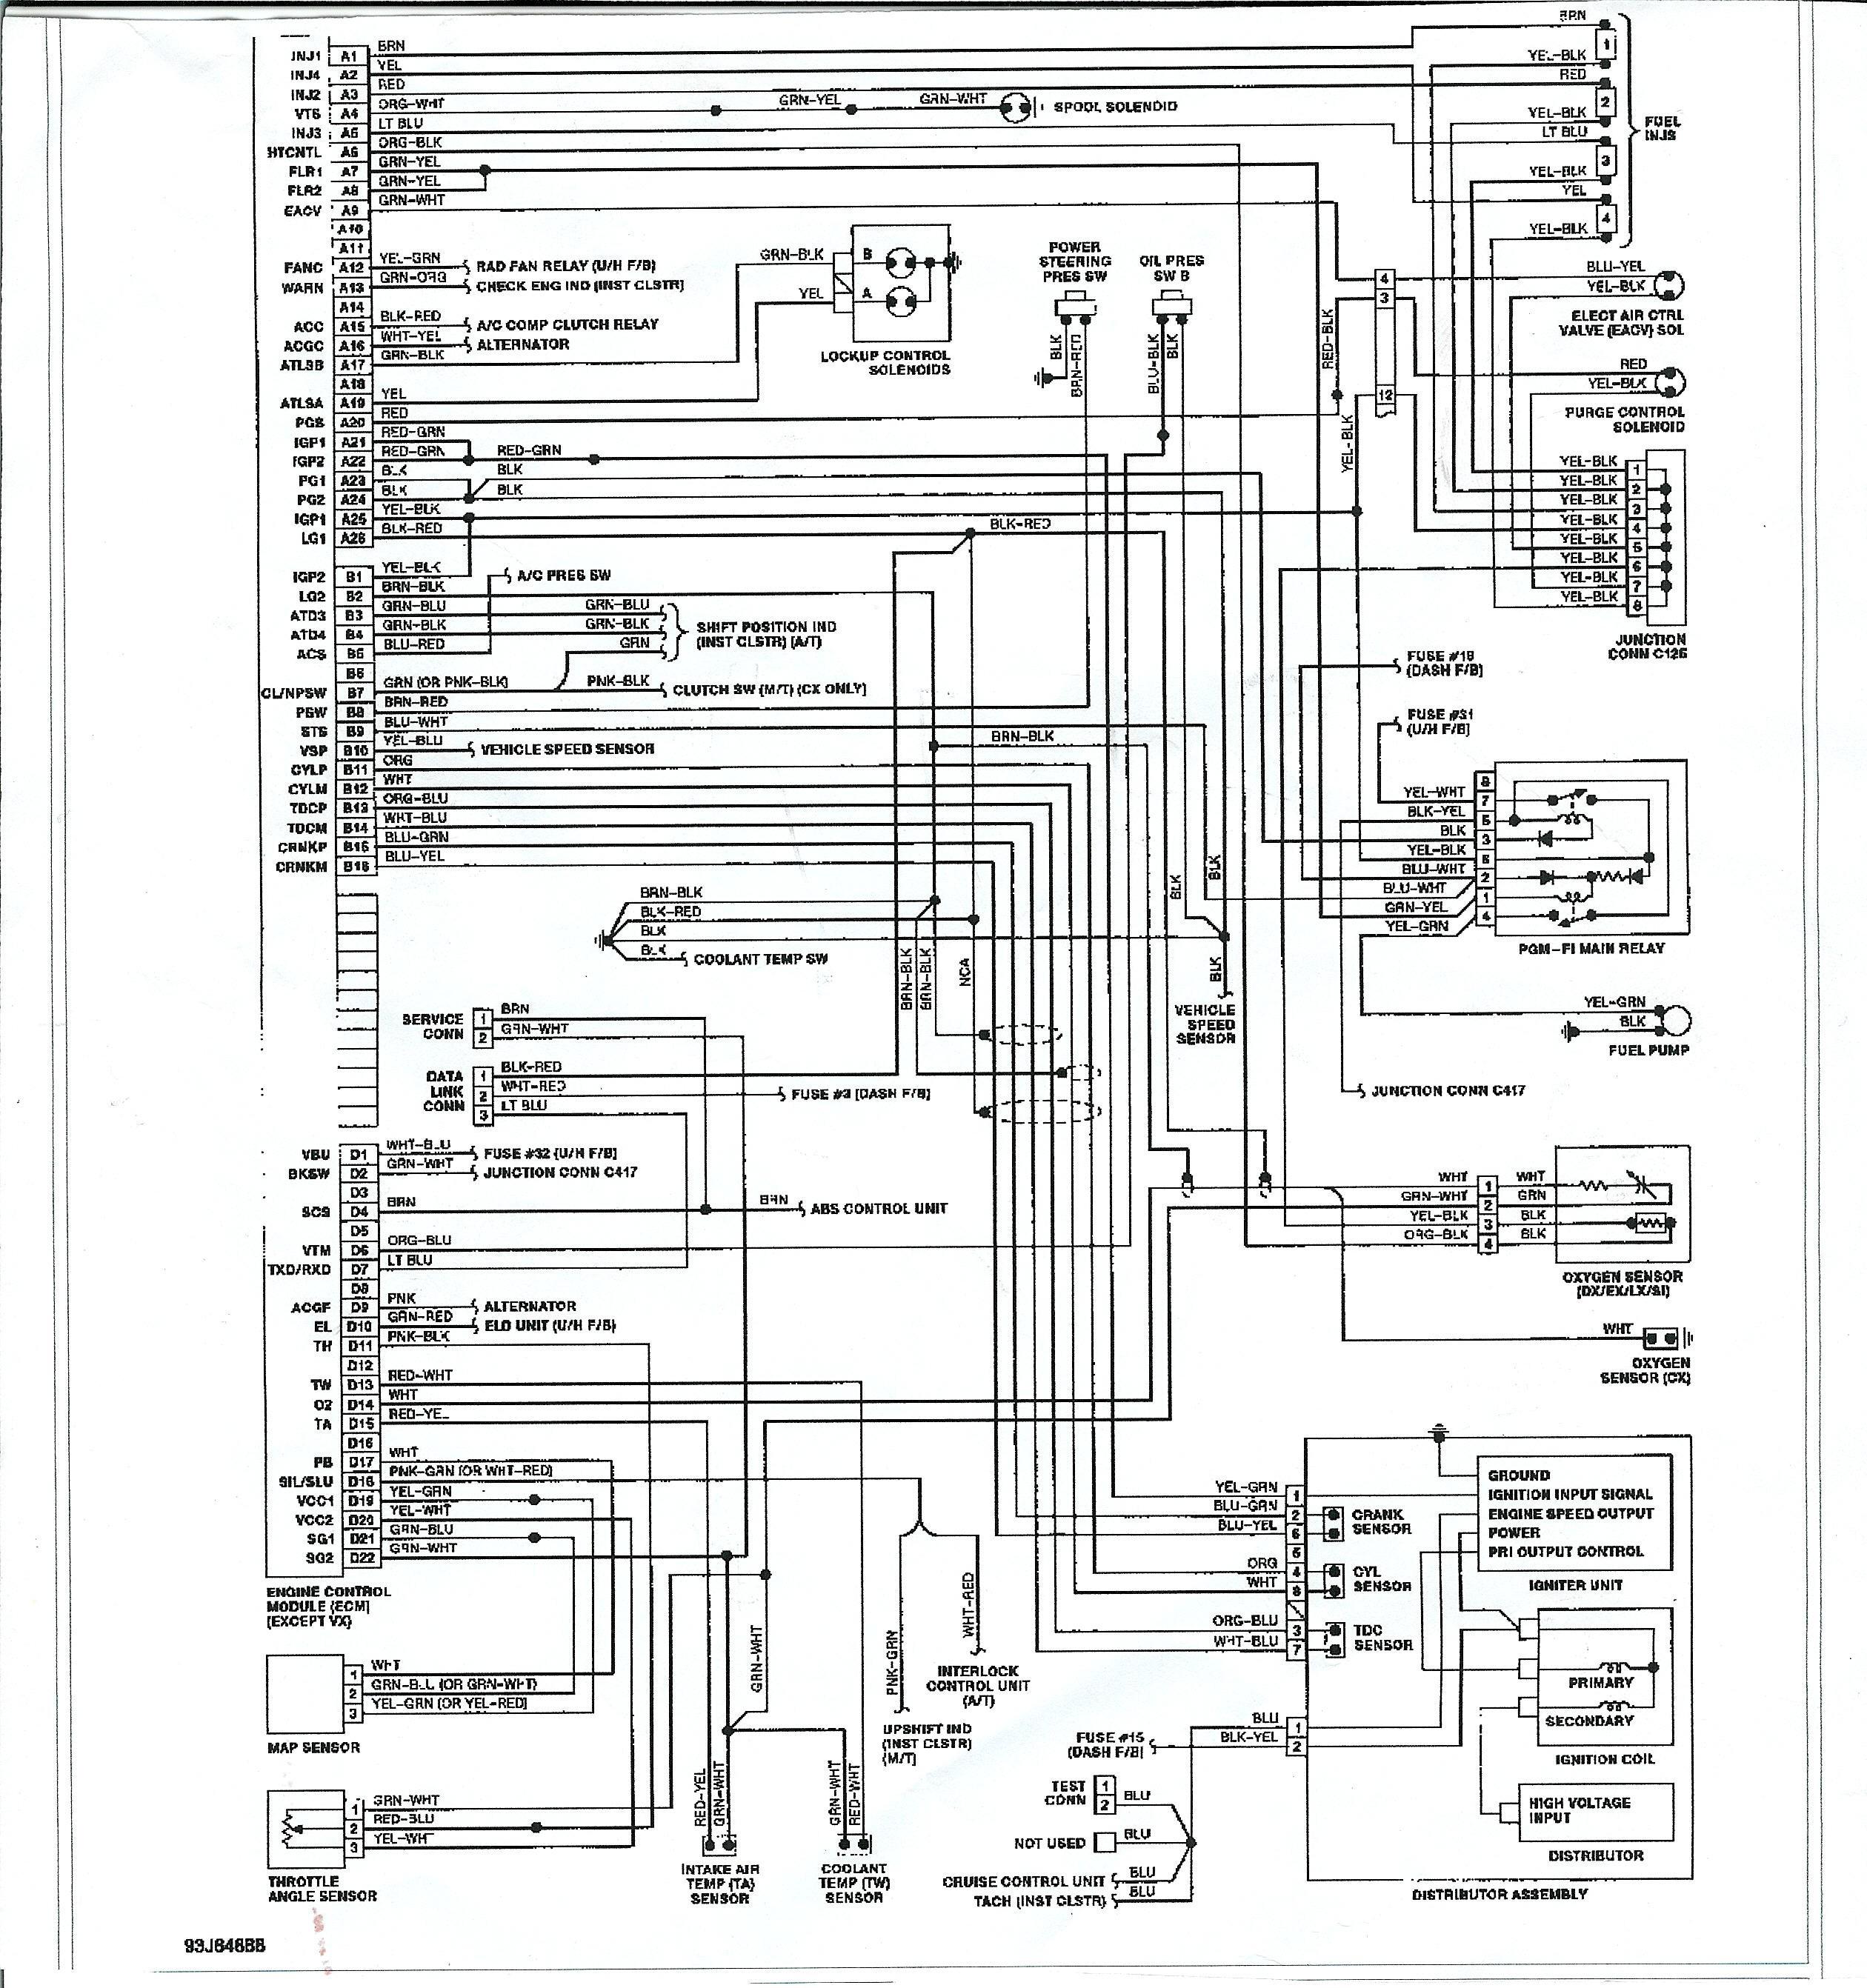 95 Honda Accord Engine Diagram 1998 Civic Cr V 98 Fuse Box 1994 Vw Transporter Wiring Of